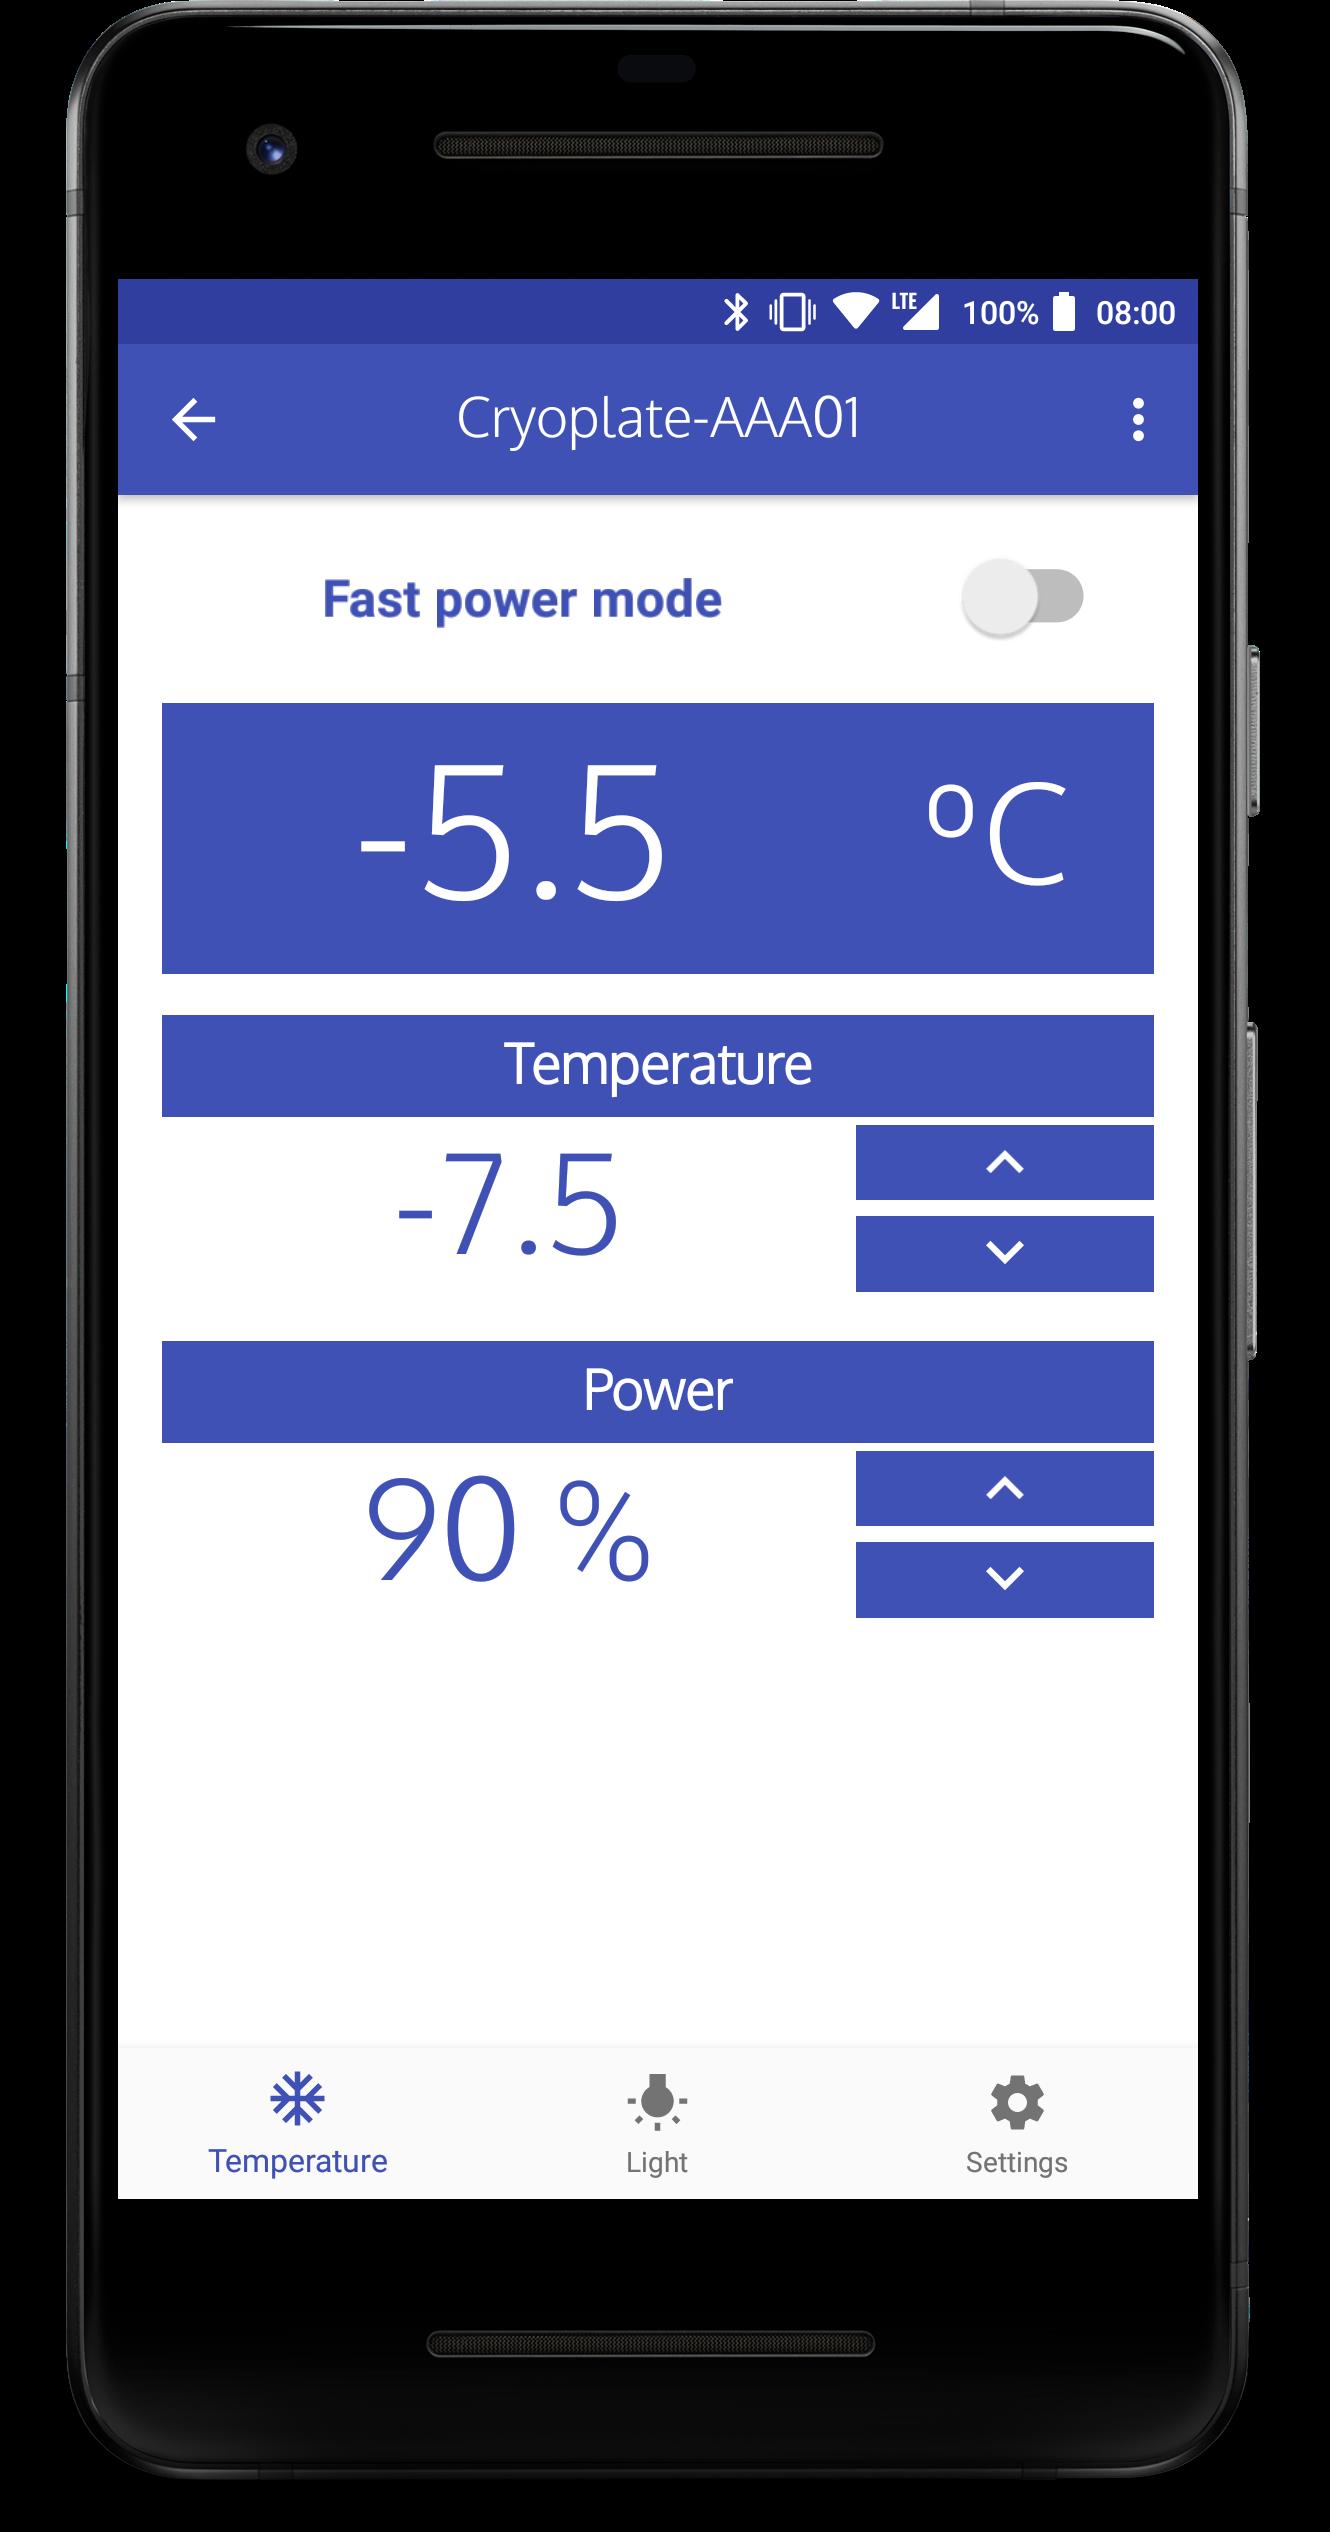 Cryoplate App temperature control